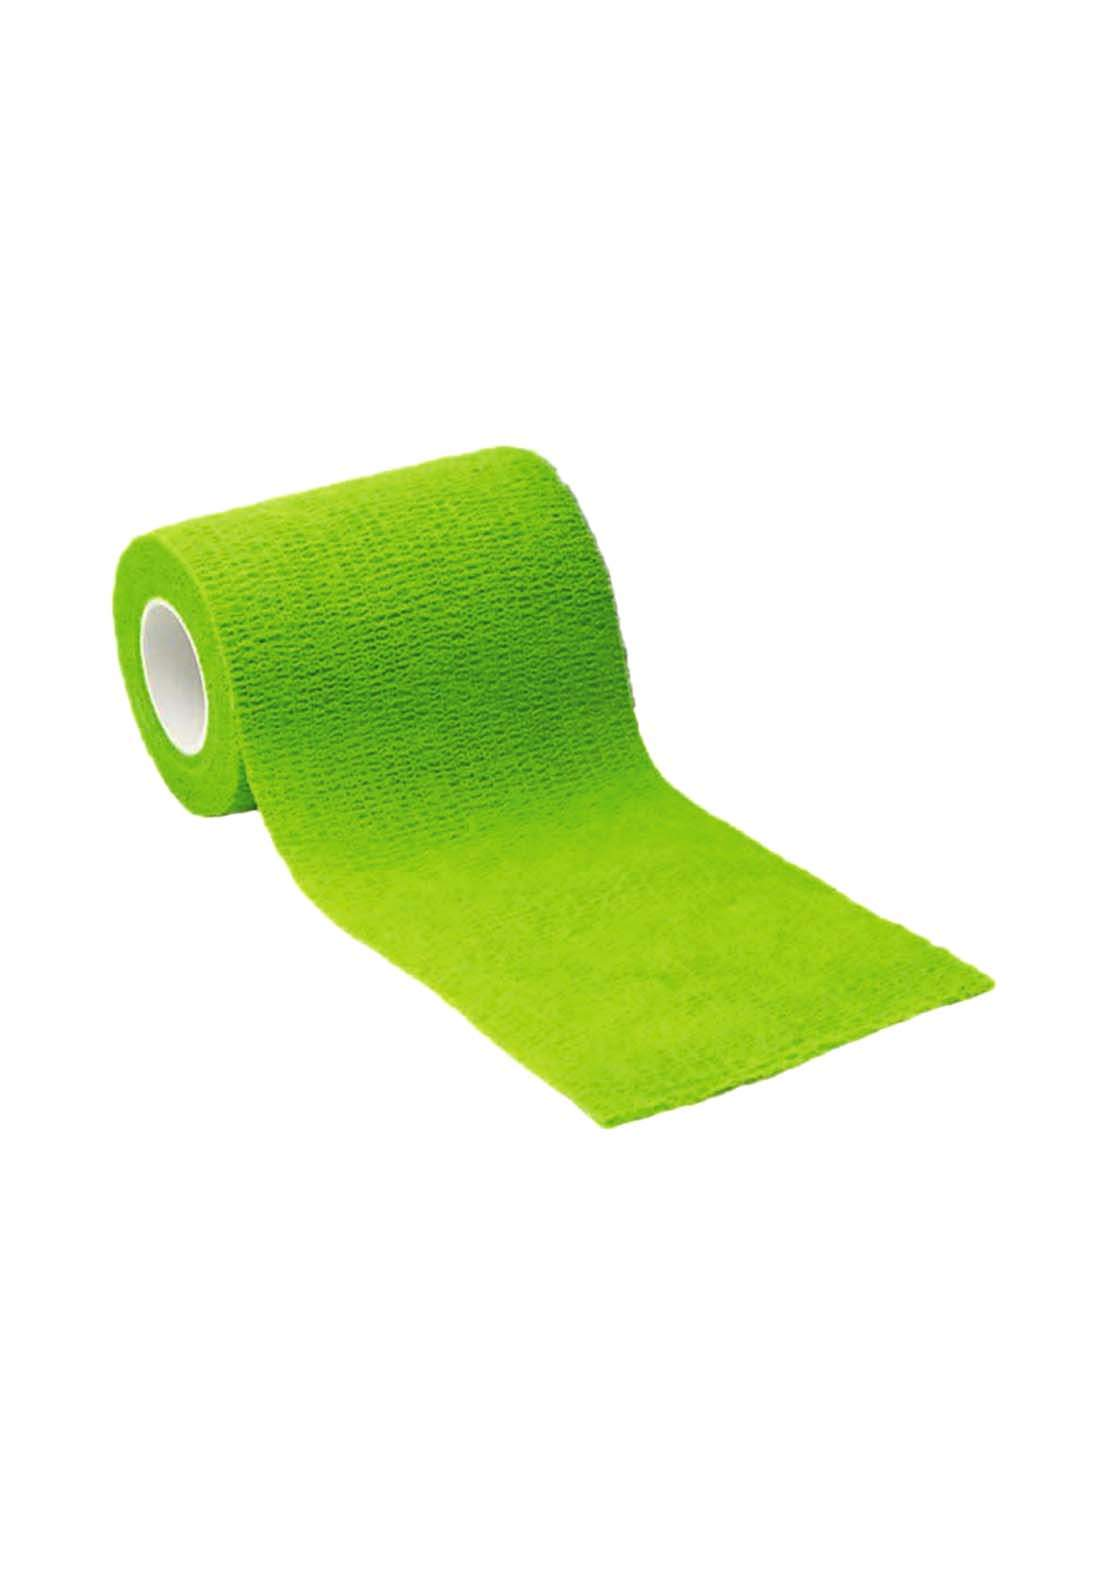 Optimal Berathable gentle tape 7.5 cm*2 m شريط لاصق طبي